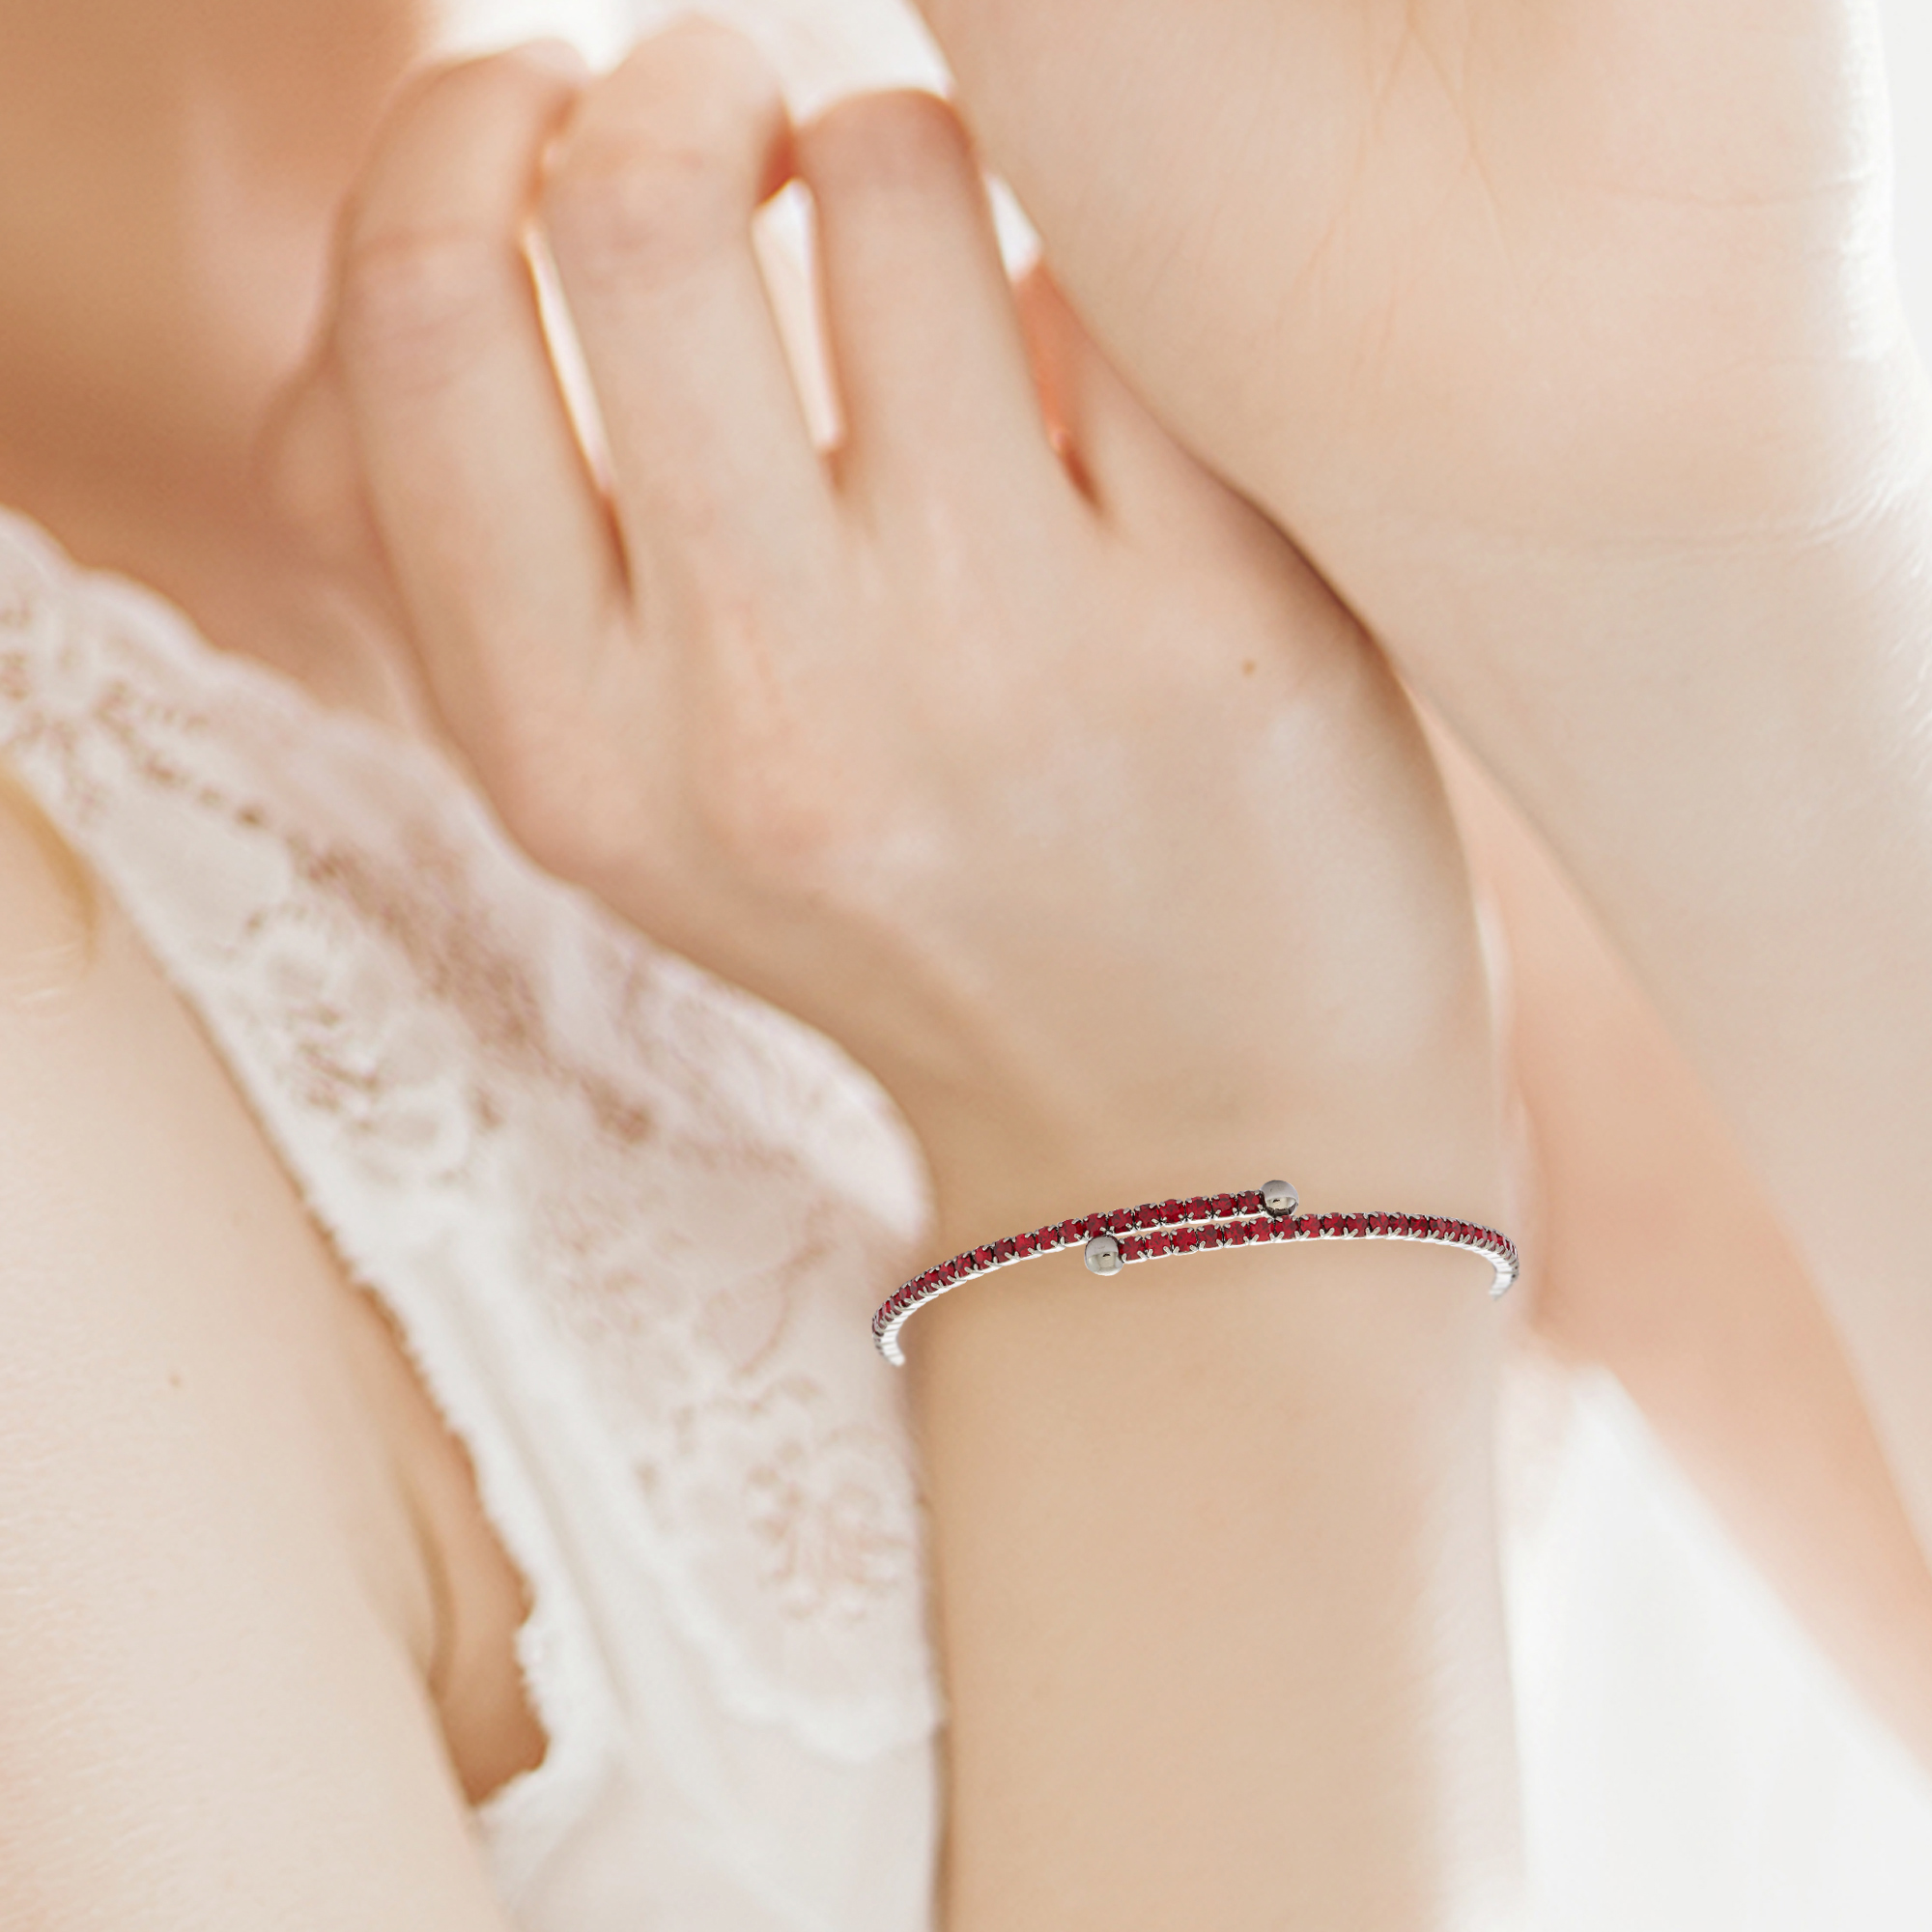 Womens-Ladies-Fashion-Accessories-Jewelry-Black-Rhodium-Plated-Bangle-Bracelet thumbnail 48